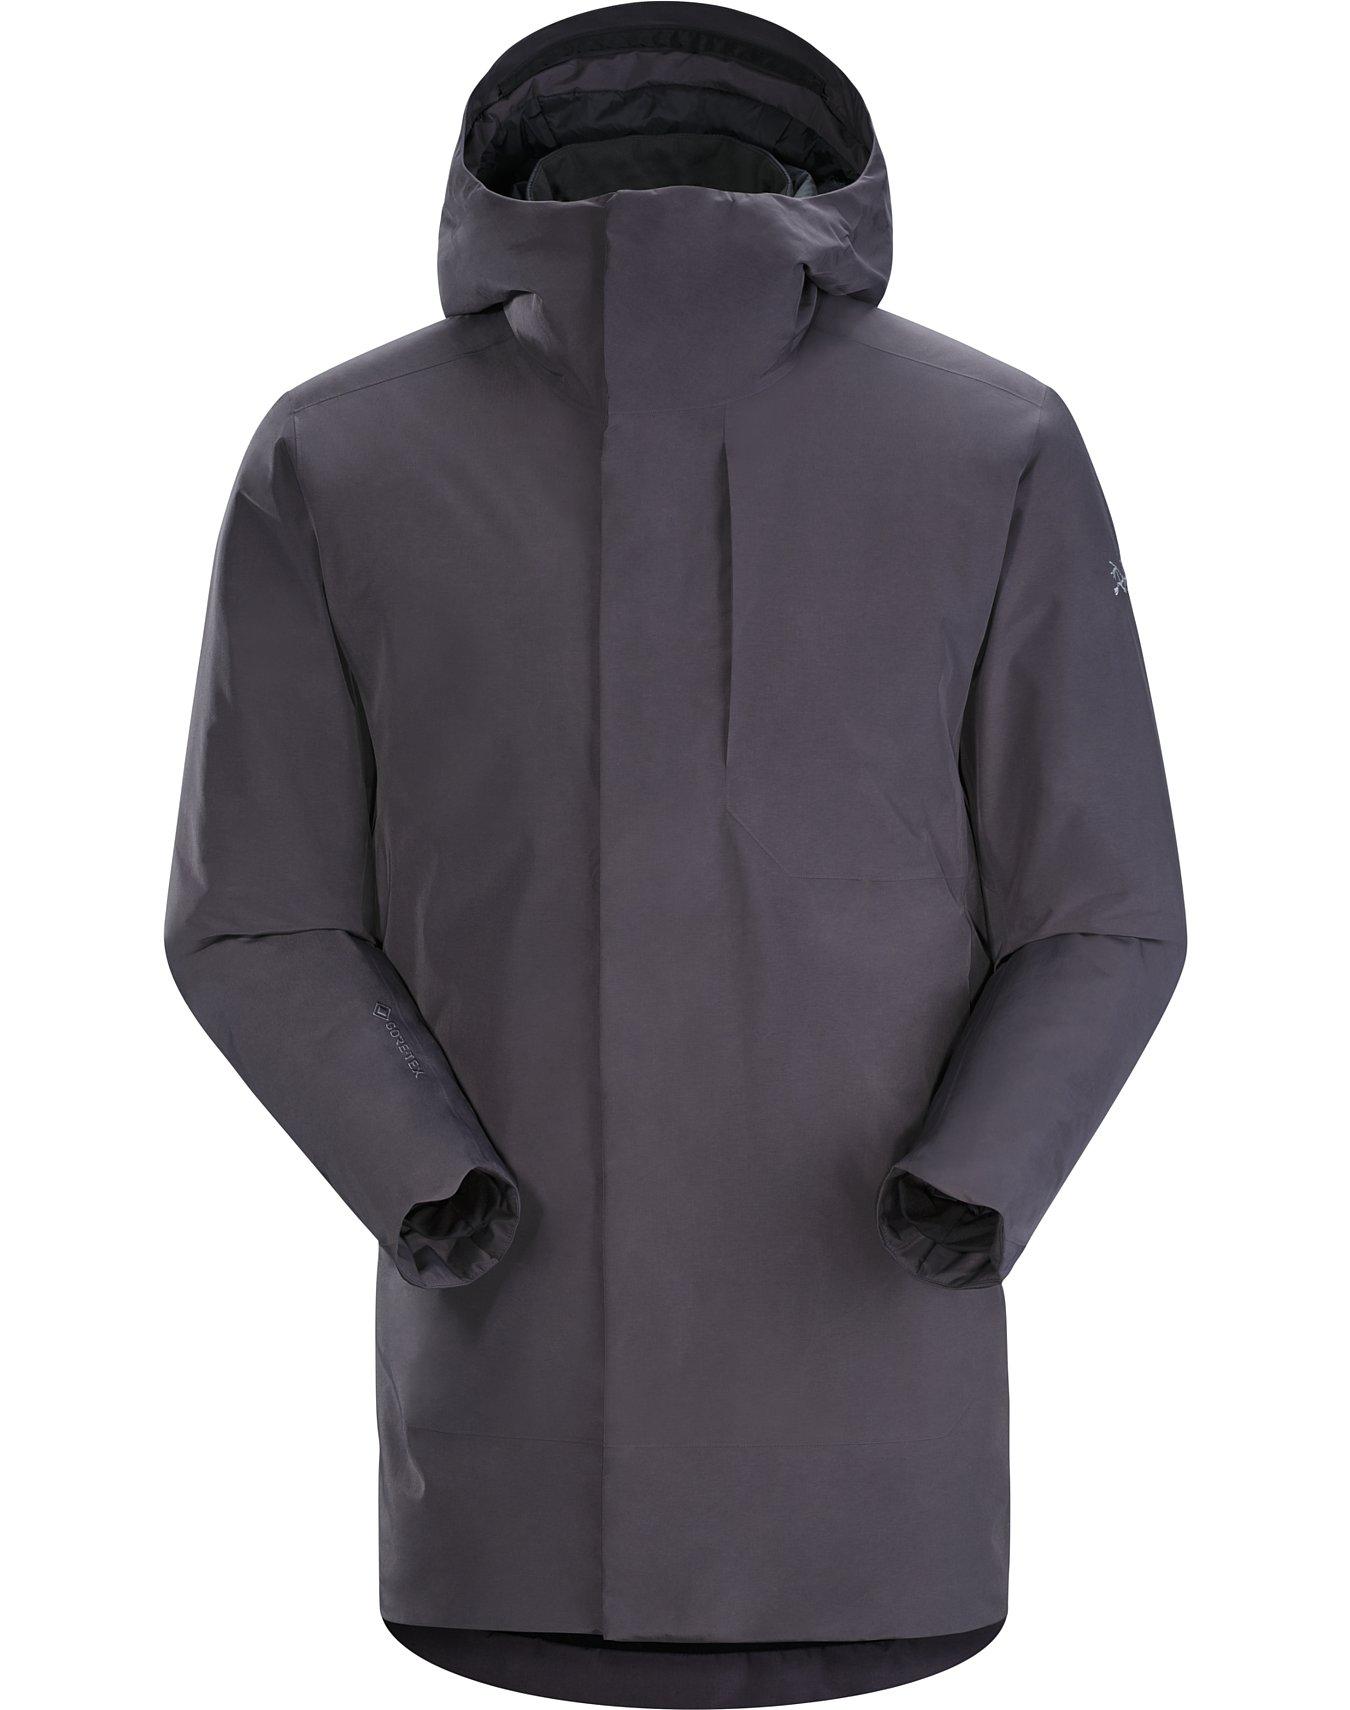 NWT Men/'s Arc/'Teryx Magnus Coat Gore-Tex Waterproof Down Jacket